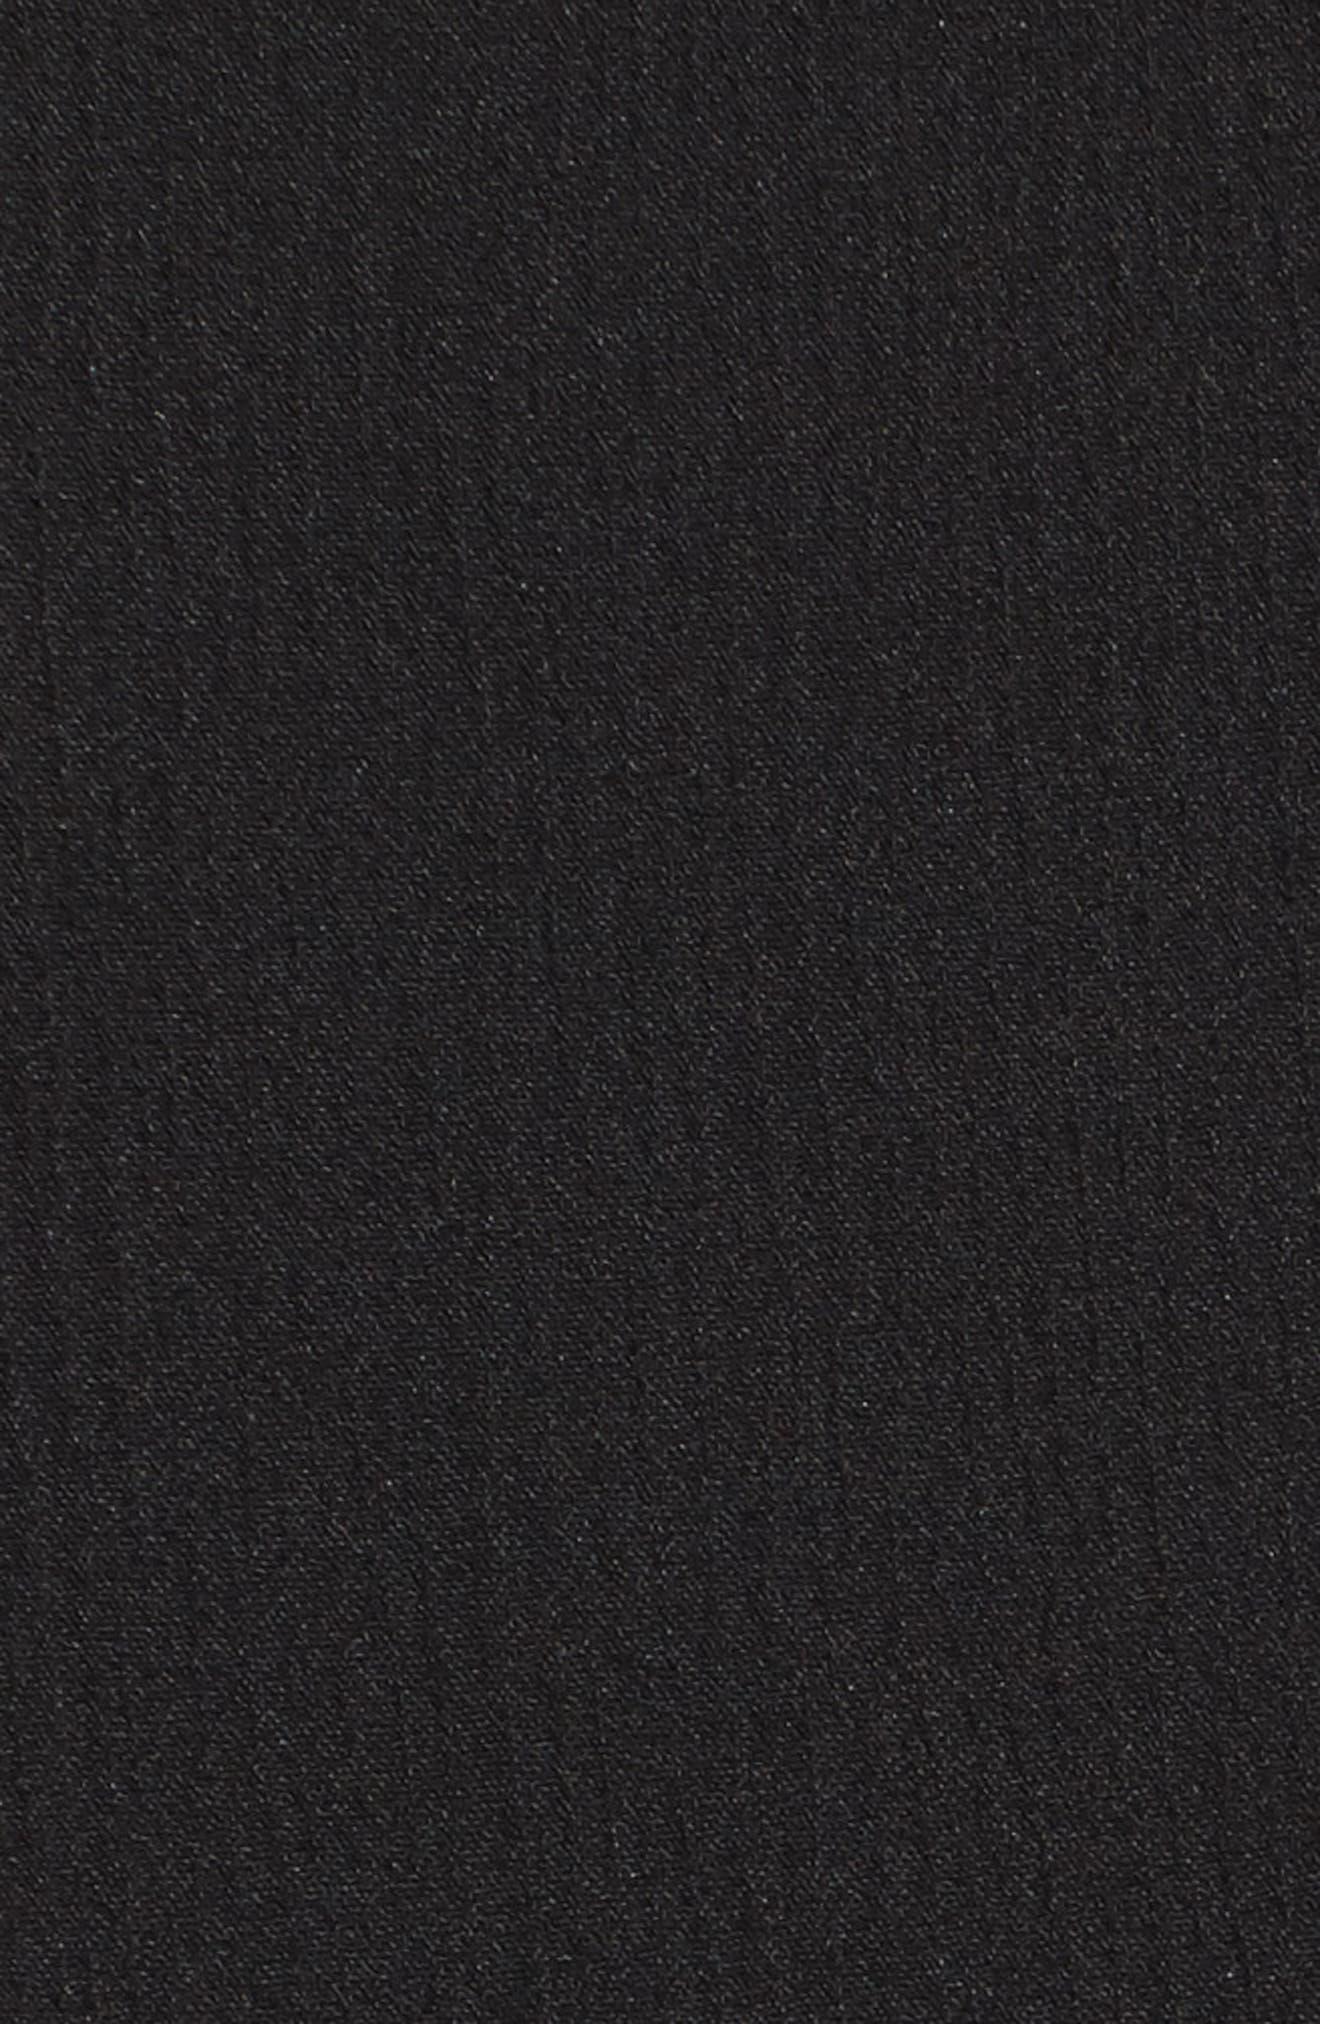 Danafea Dress,                             Alternate thumbnail 5, color,                             001